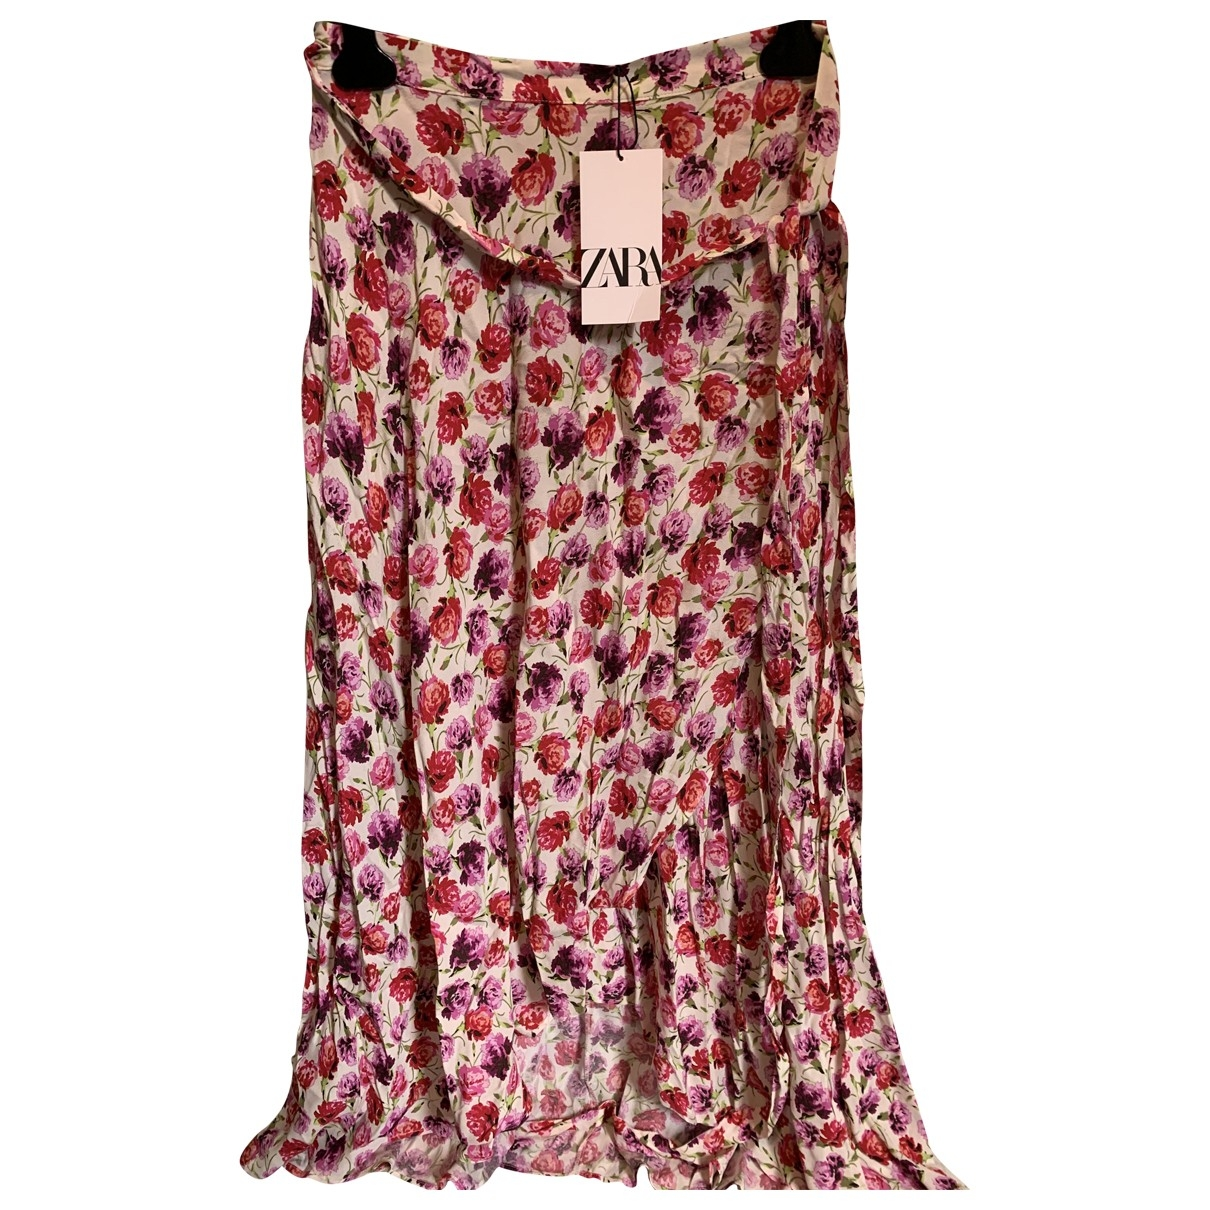 Zara - Jupe   pour femme - rose